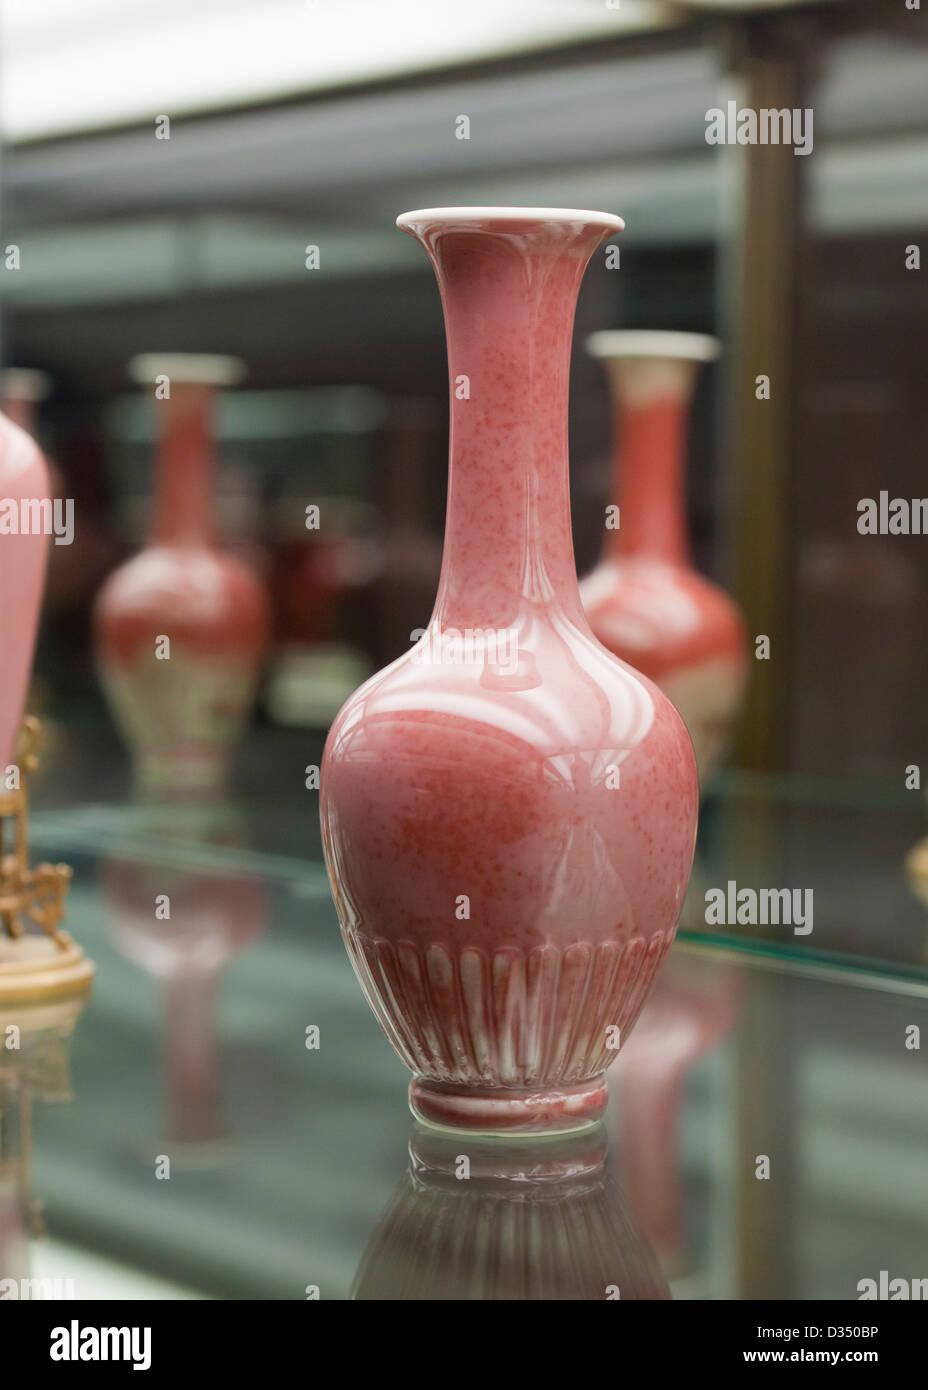 Amphora vase - China, Kangxi Reign, peachbloom mottle glazed porcelain, 17th - 18th century - Stock Image